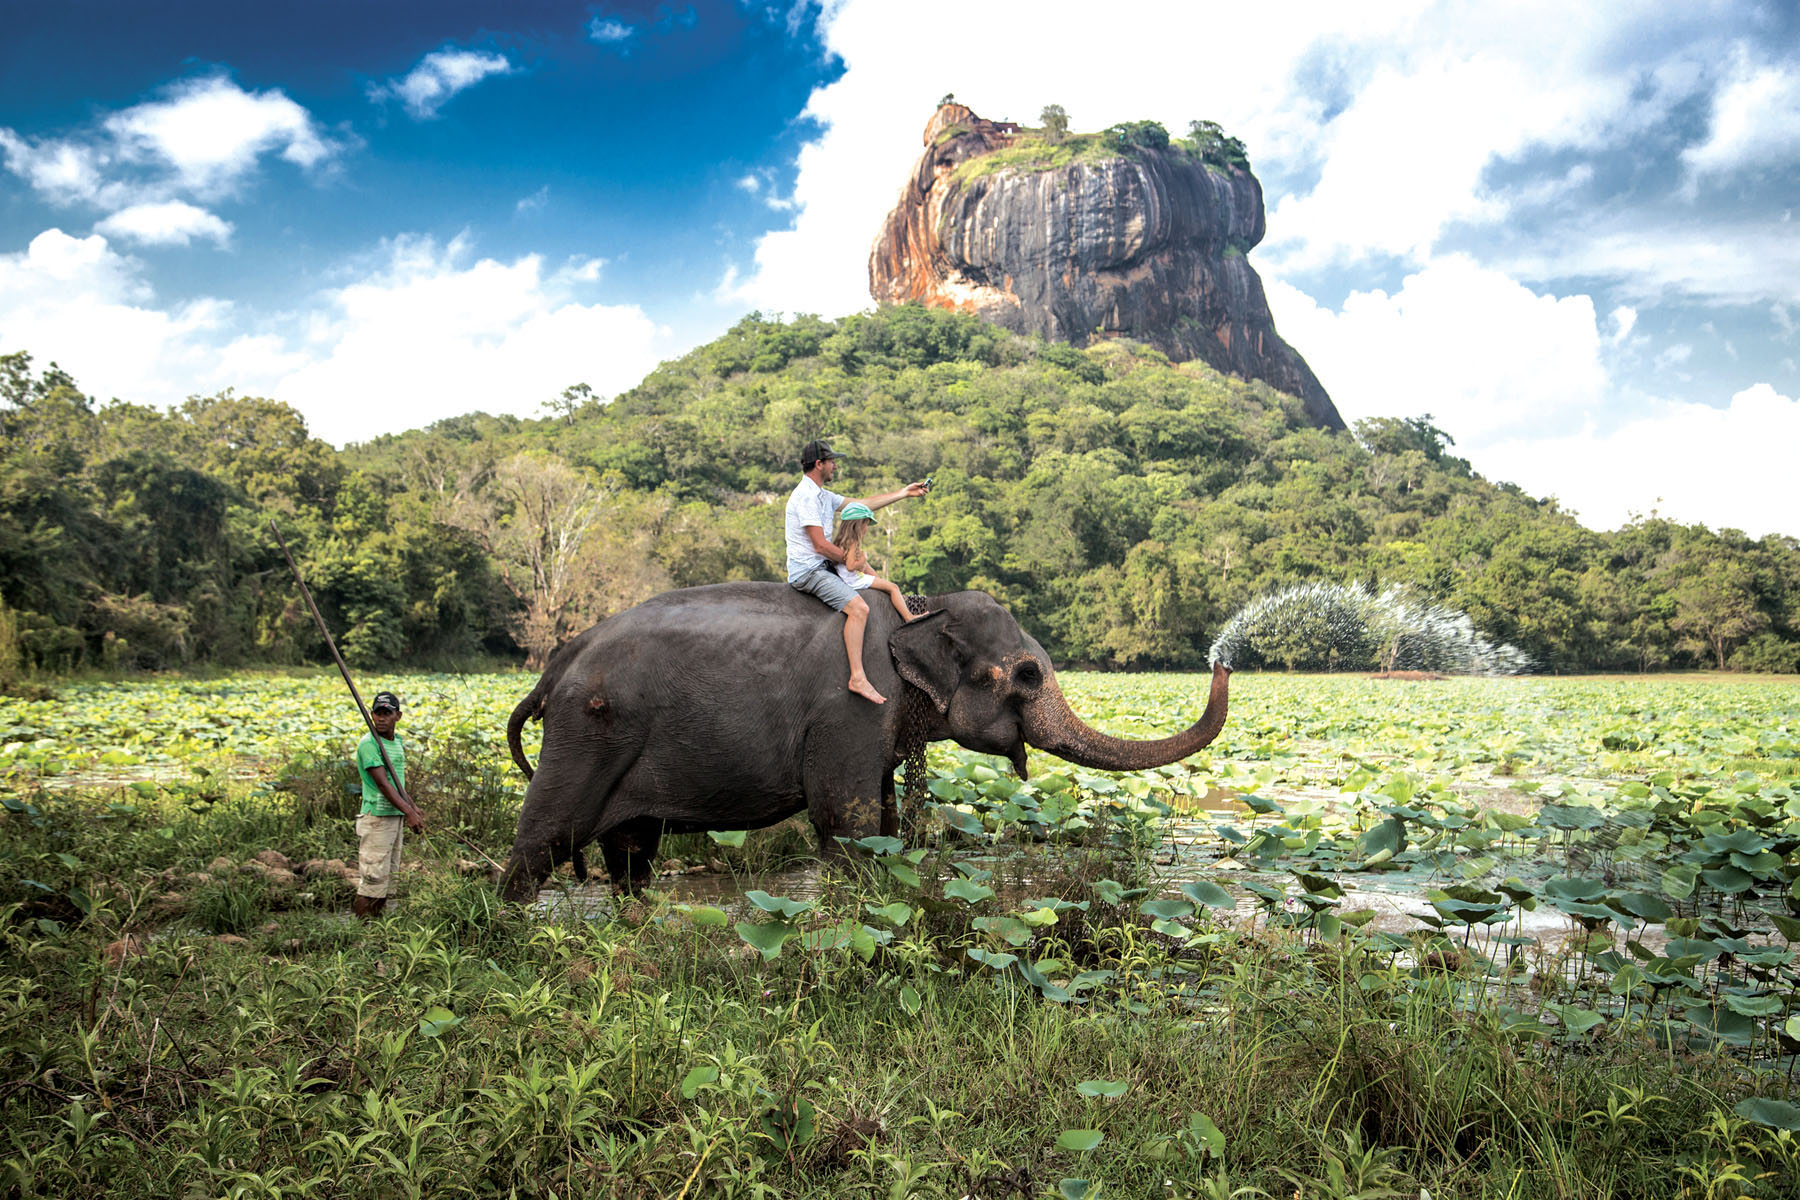 Sri-Lanka-Sigiriya_184968215-2